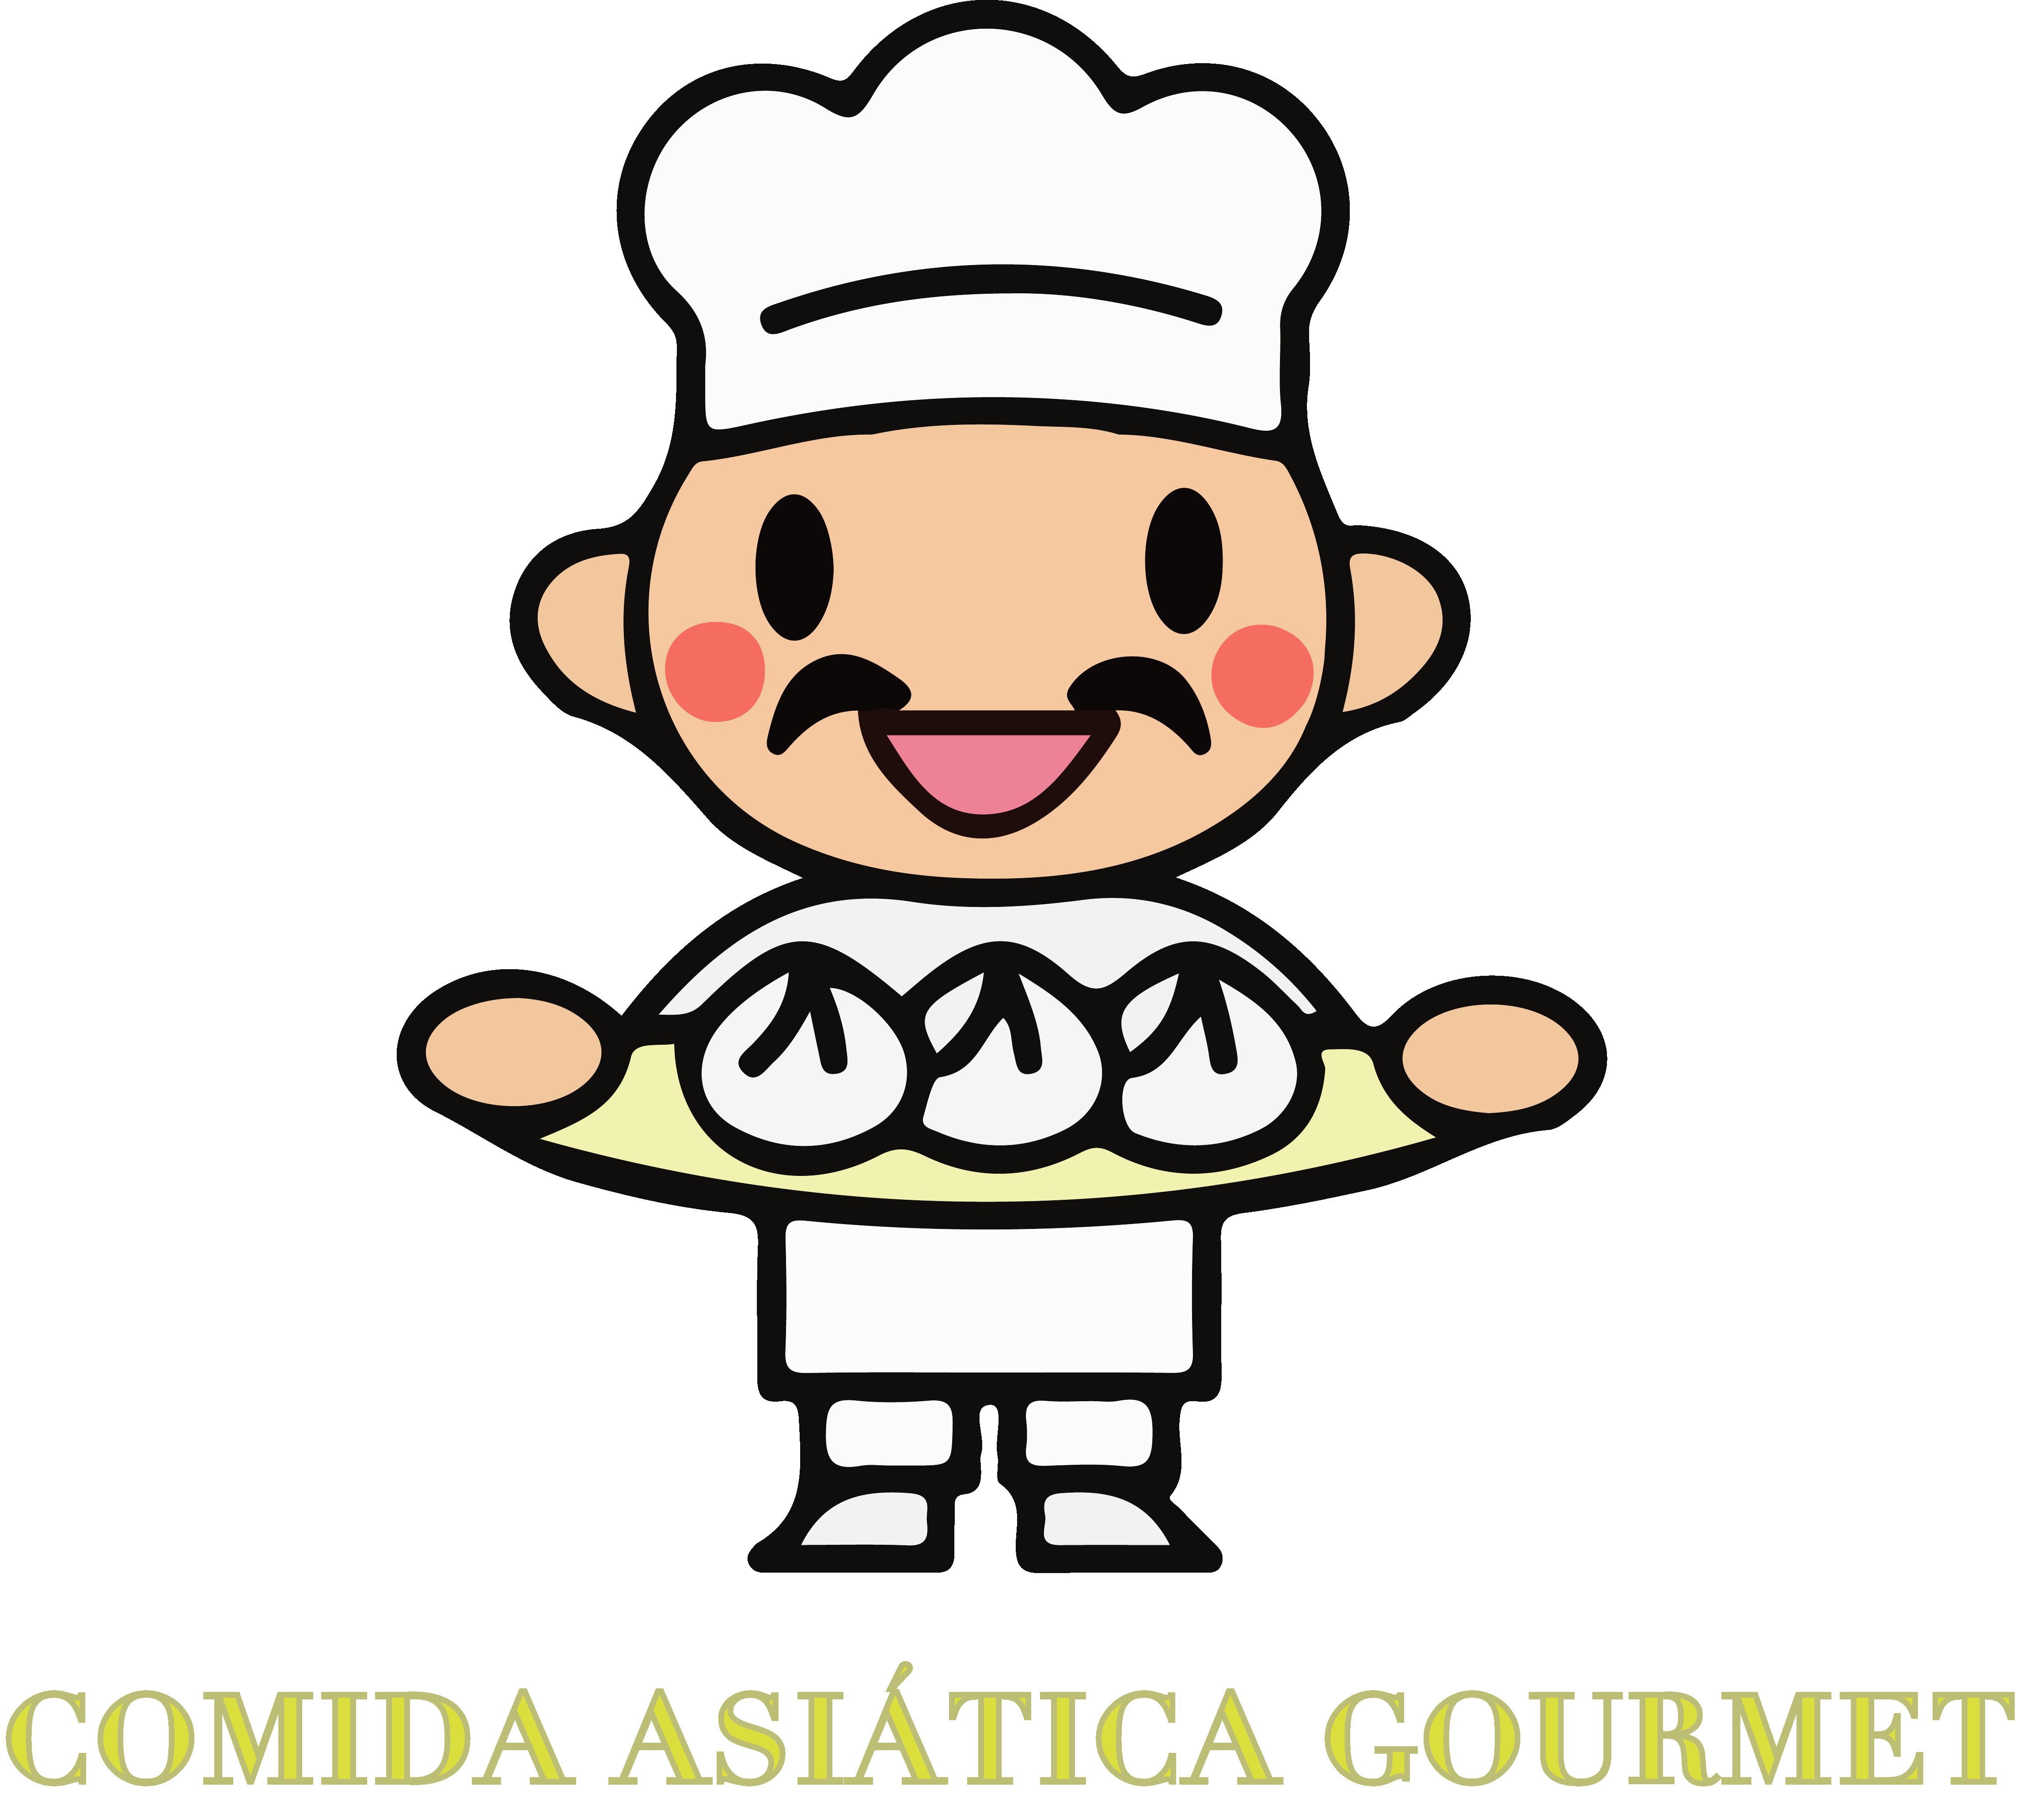 COMIDA ASIATICA GOURMET